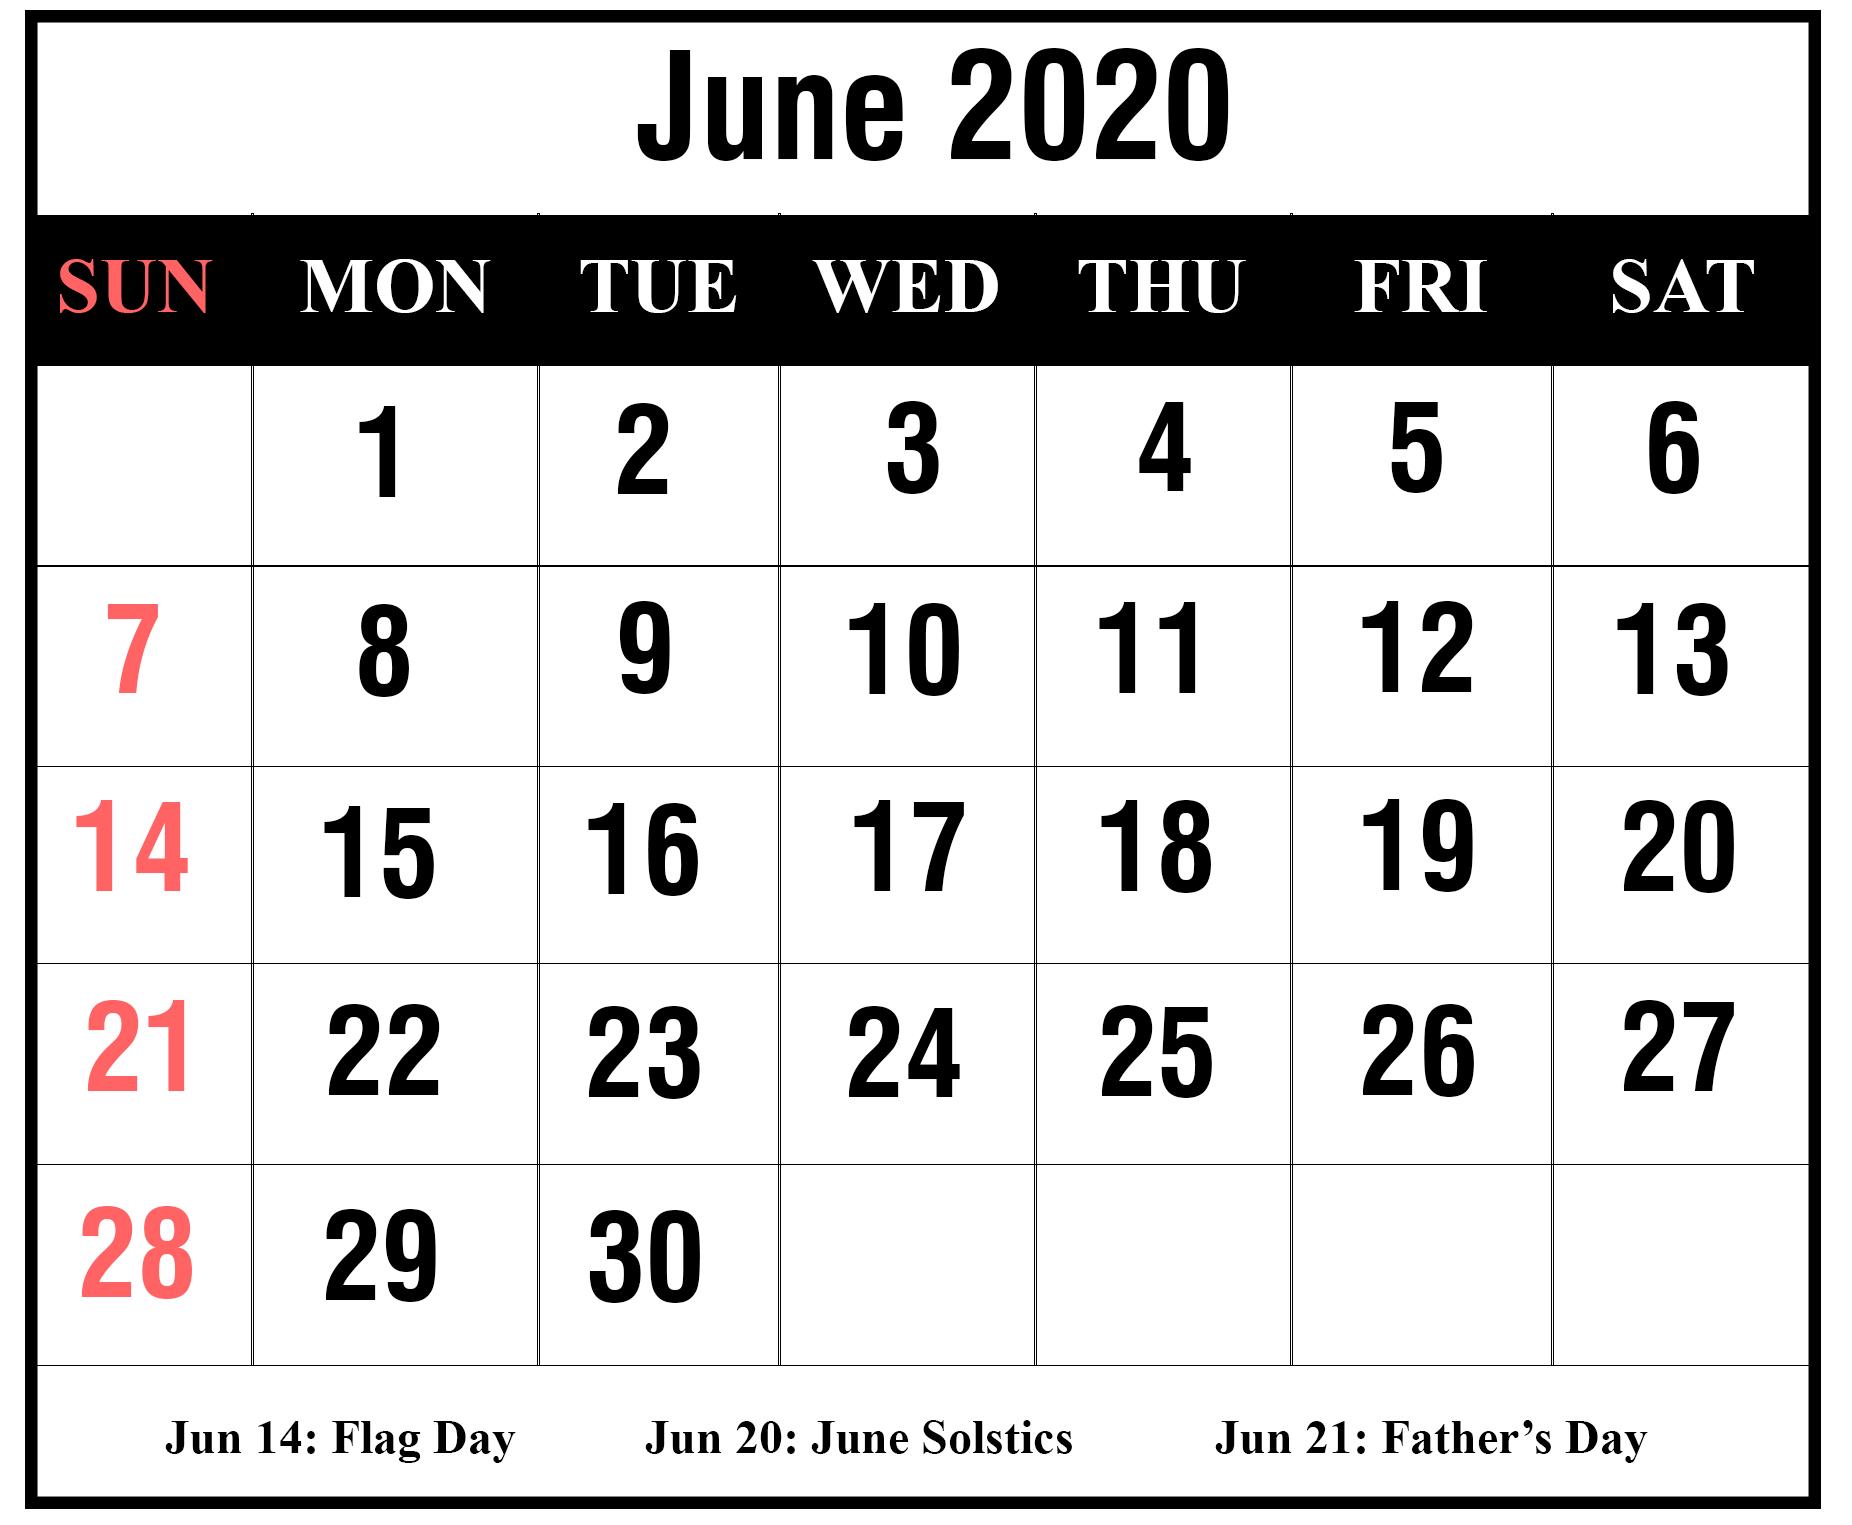 Free Printable June 2020 Calendar Templates [Pdf,word,excel pertaining to National Day Calendar 2020 Printable